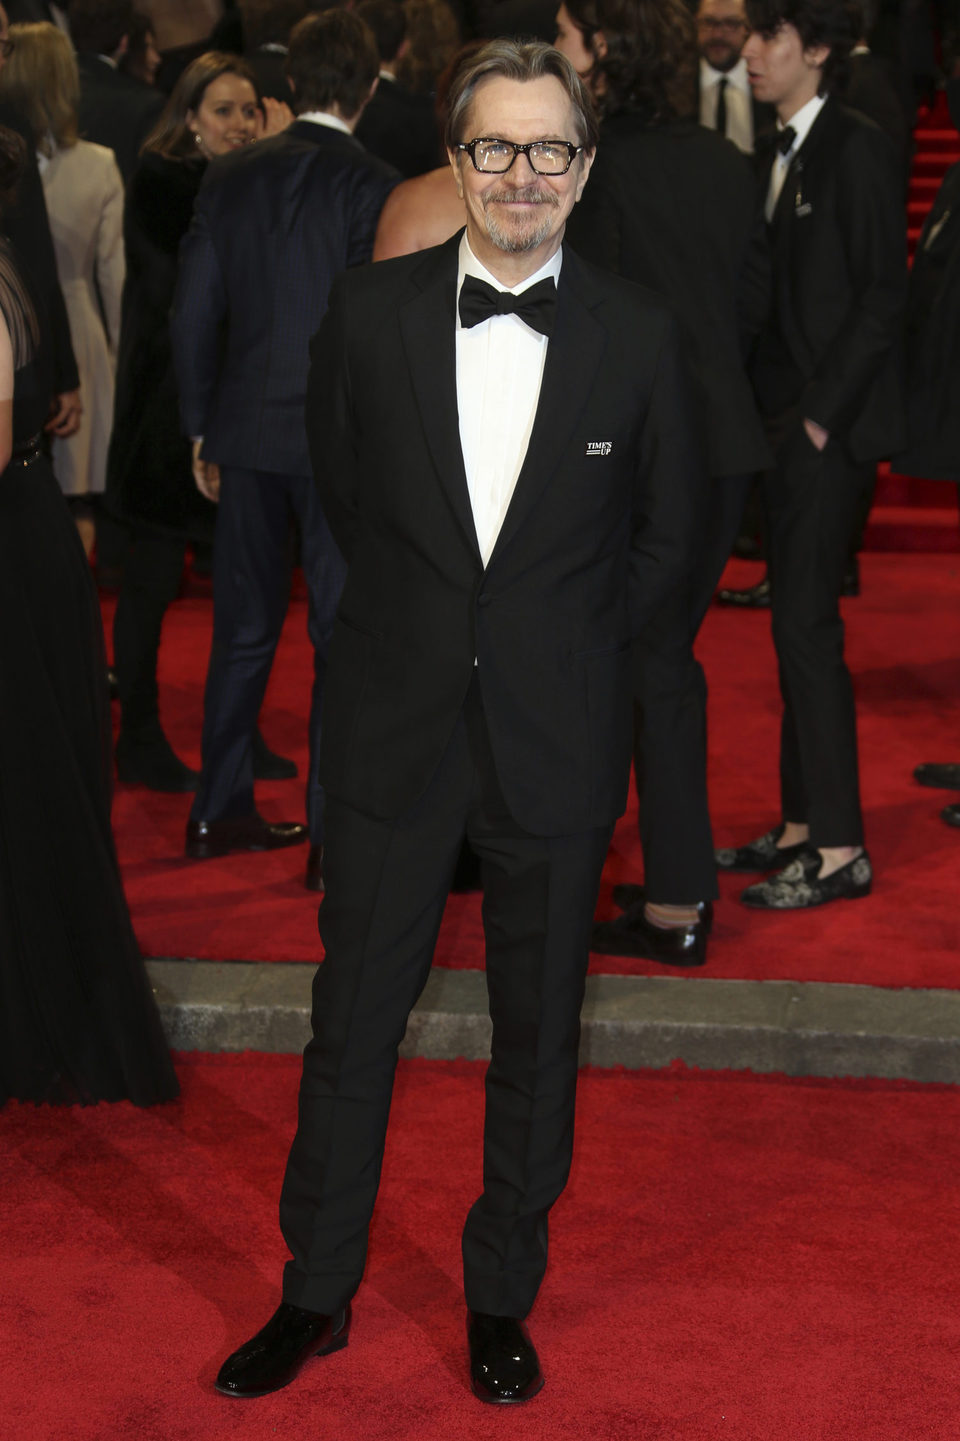 Gary Oldman at the BAFTA Awards' 2018 red carpet